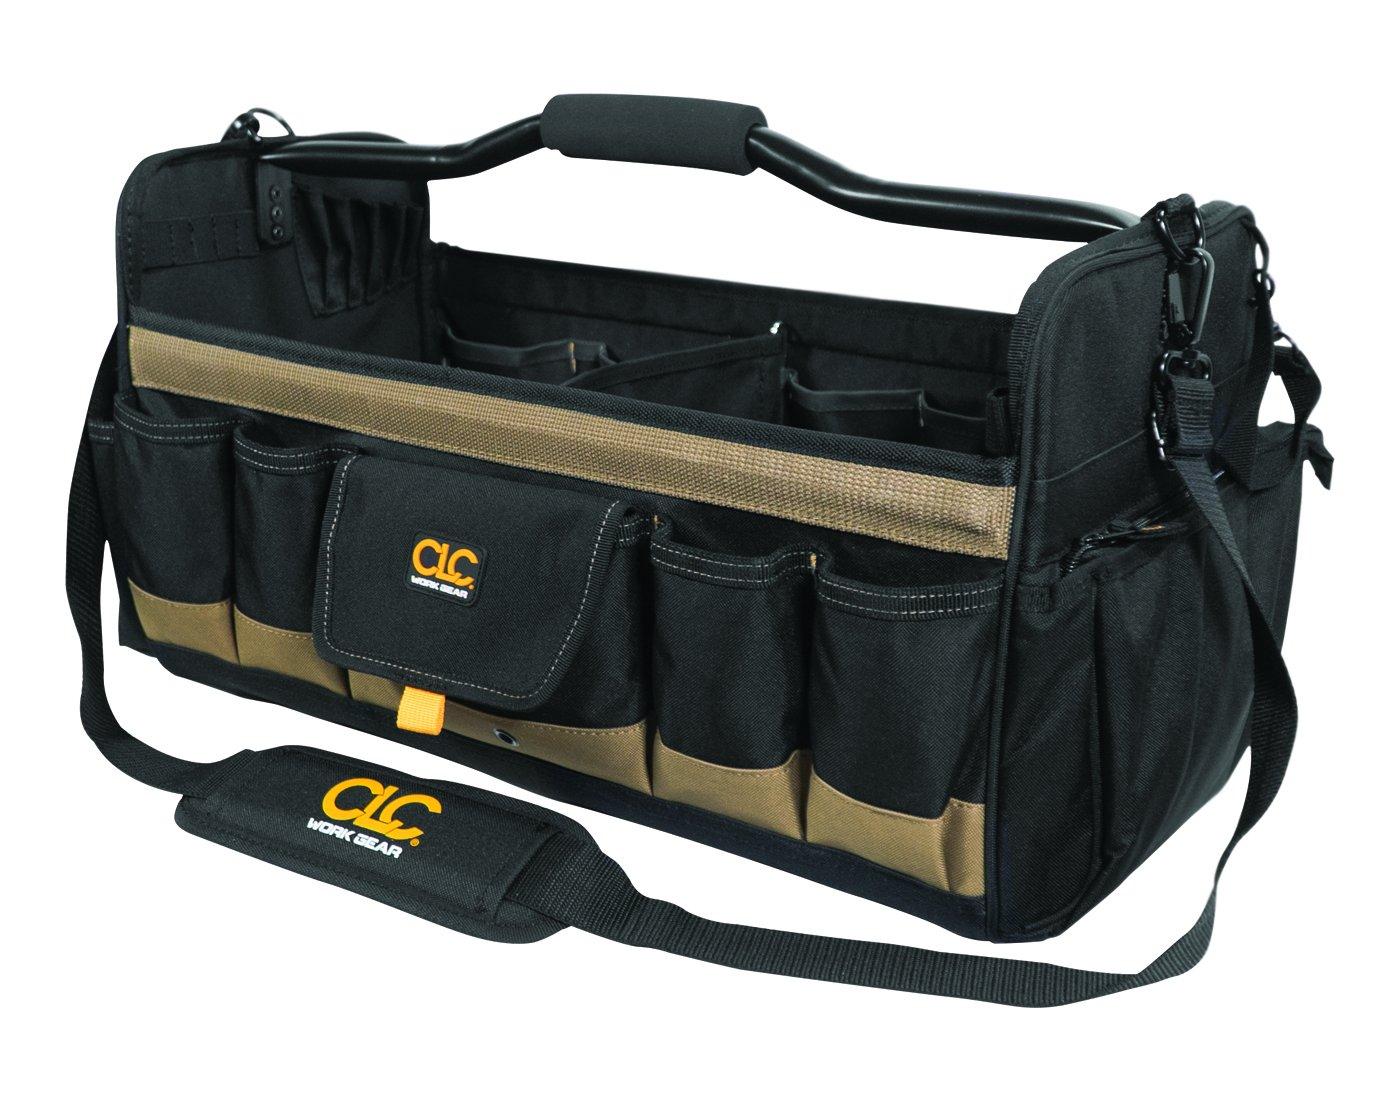 CLC Custom Leathercraft 1579 20 Inch, Open Top, Soft Sided Tool Box, 27 Pockets by Custom Leathercraft (Image #4)